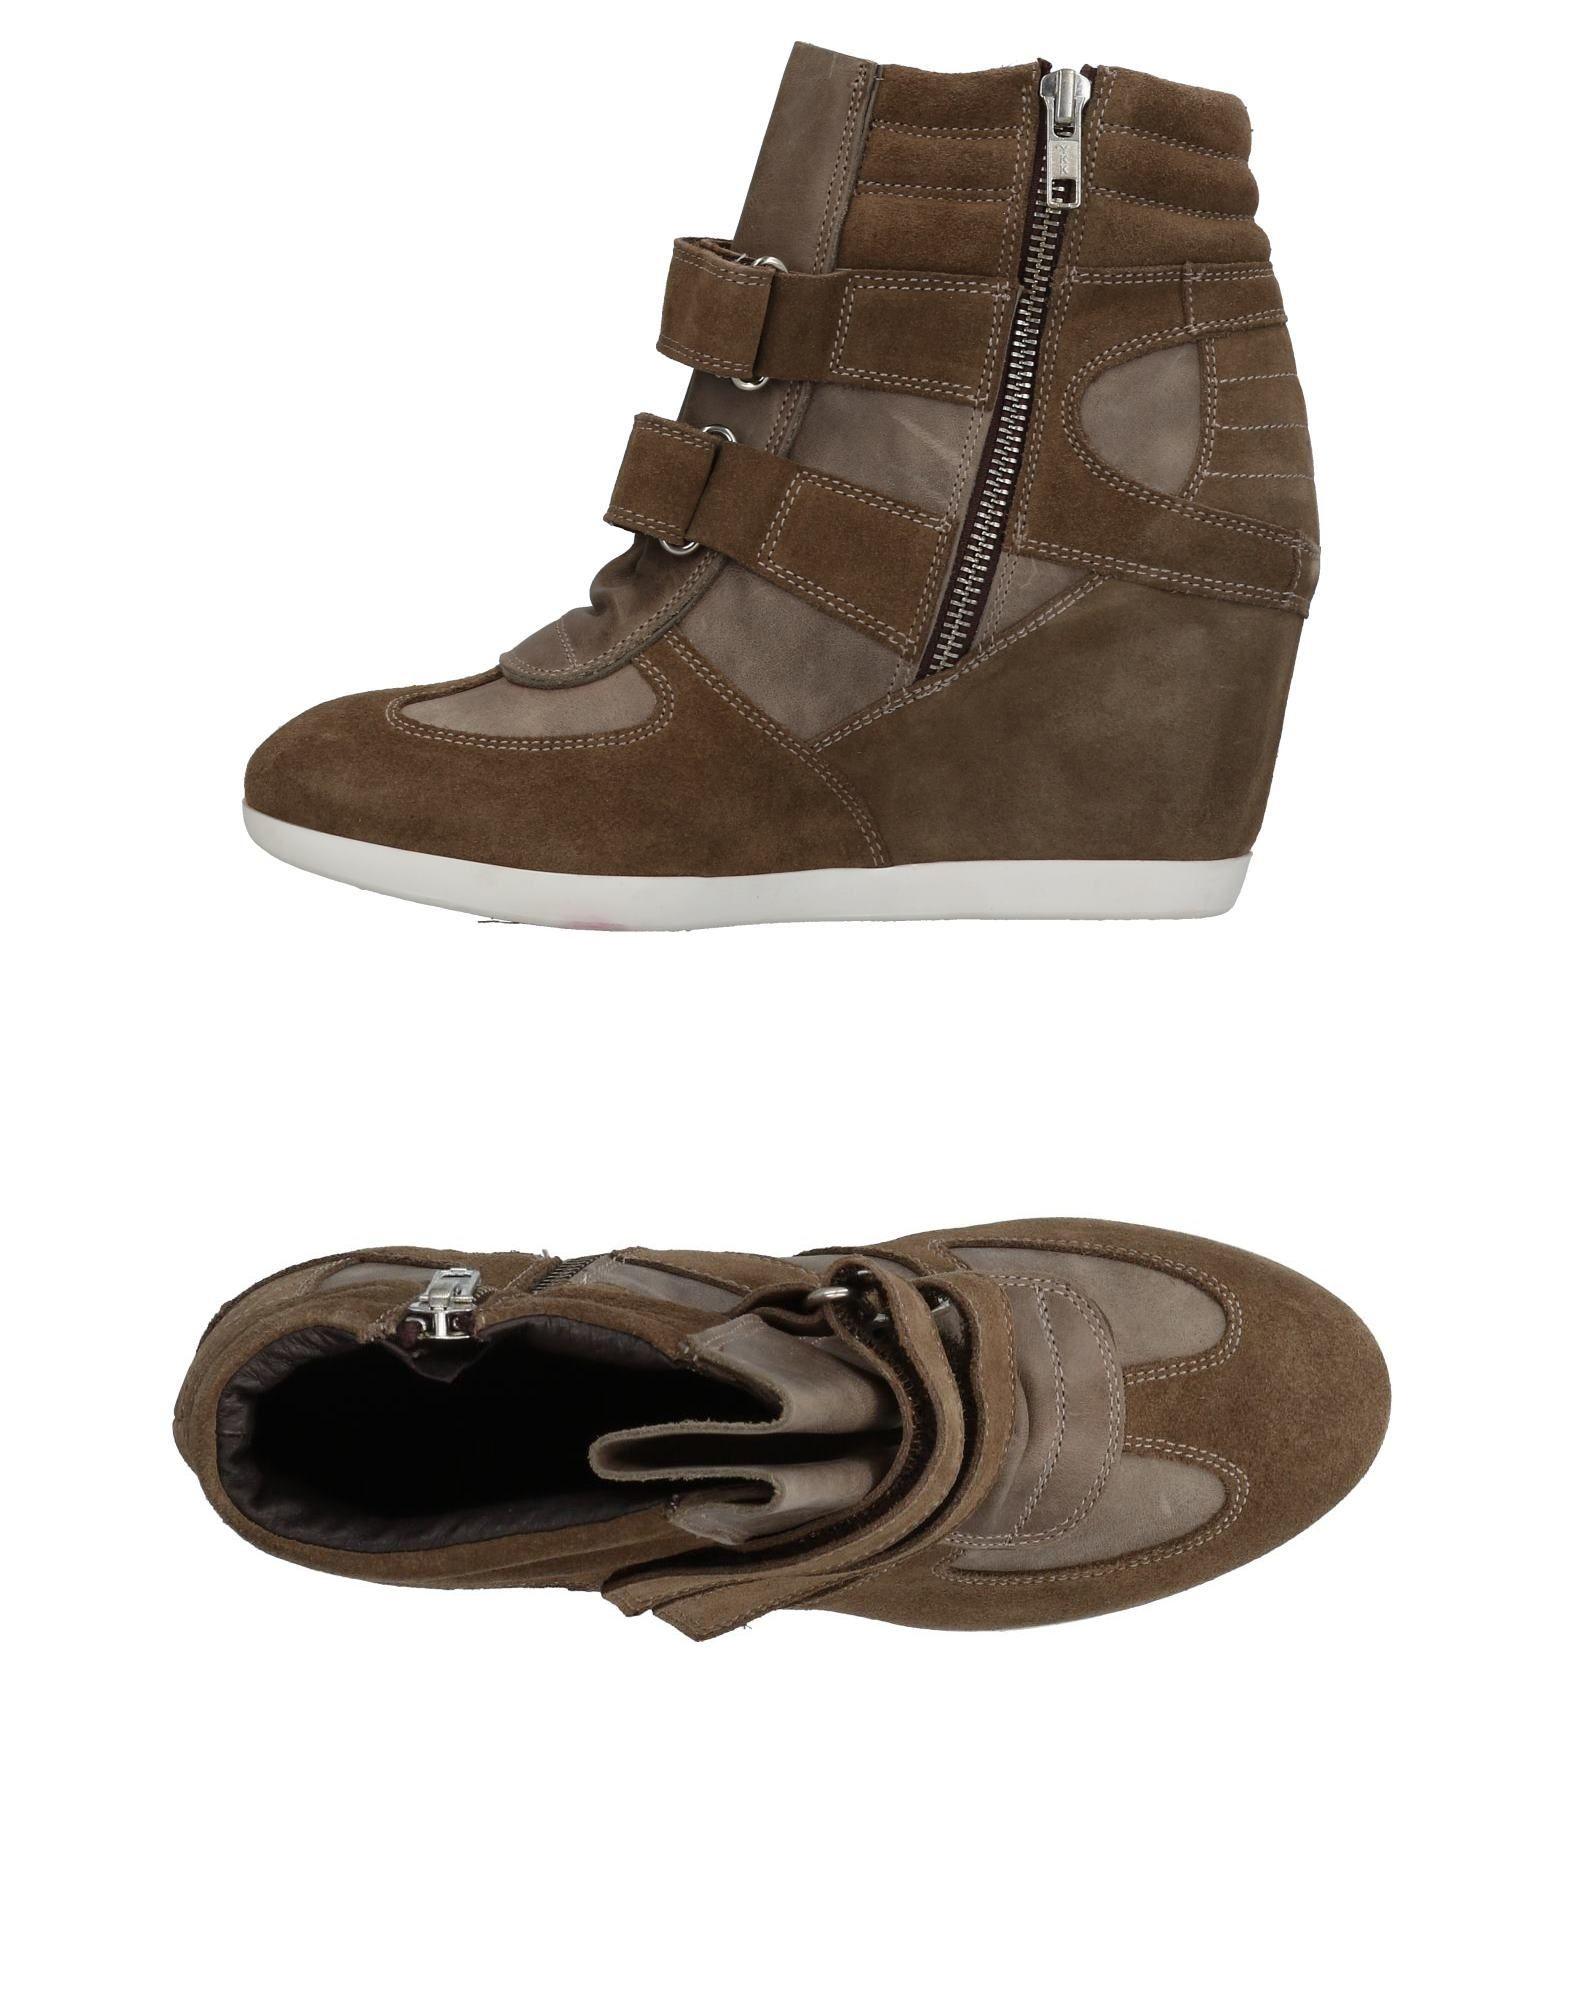 SCEE by TWIN-SET Высокие кеды и кроссовки scee by twin set полусапоги и высокие ботинки